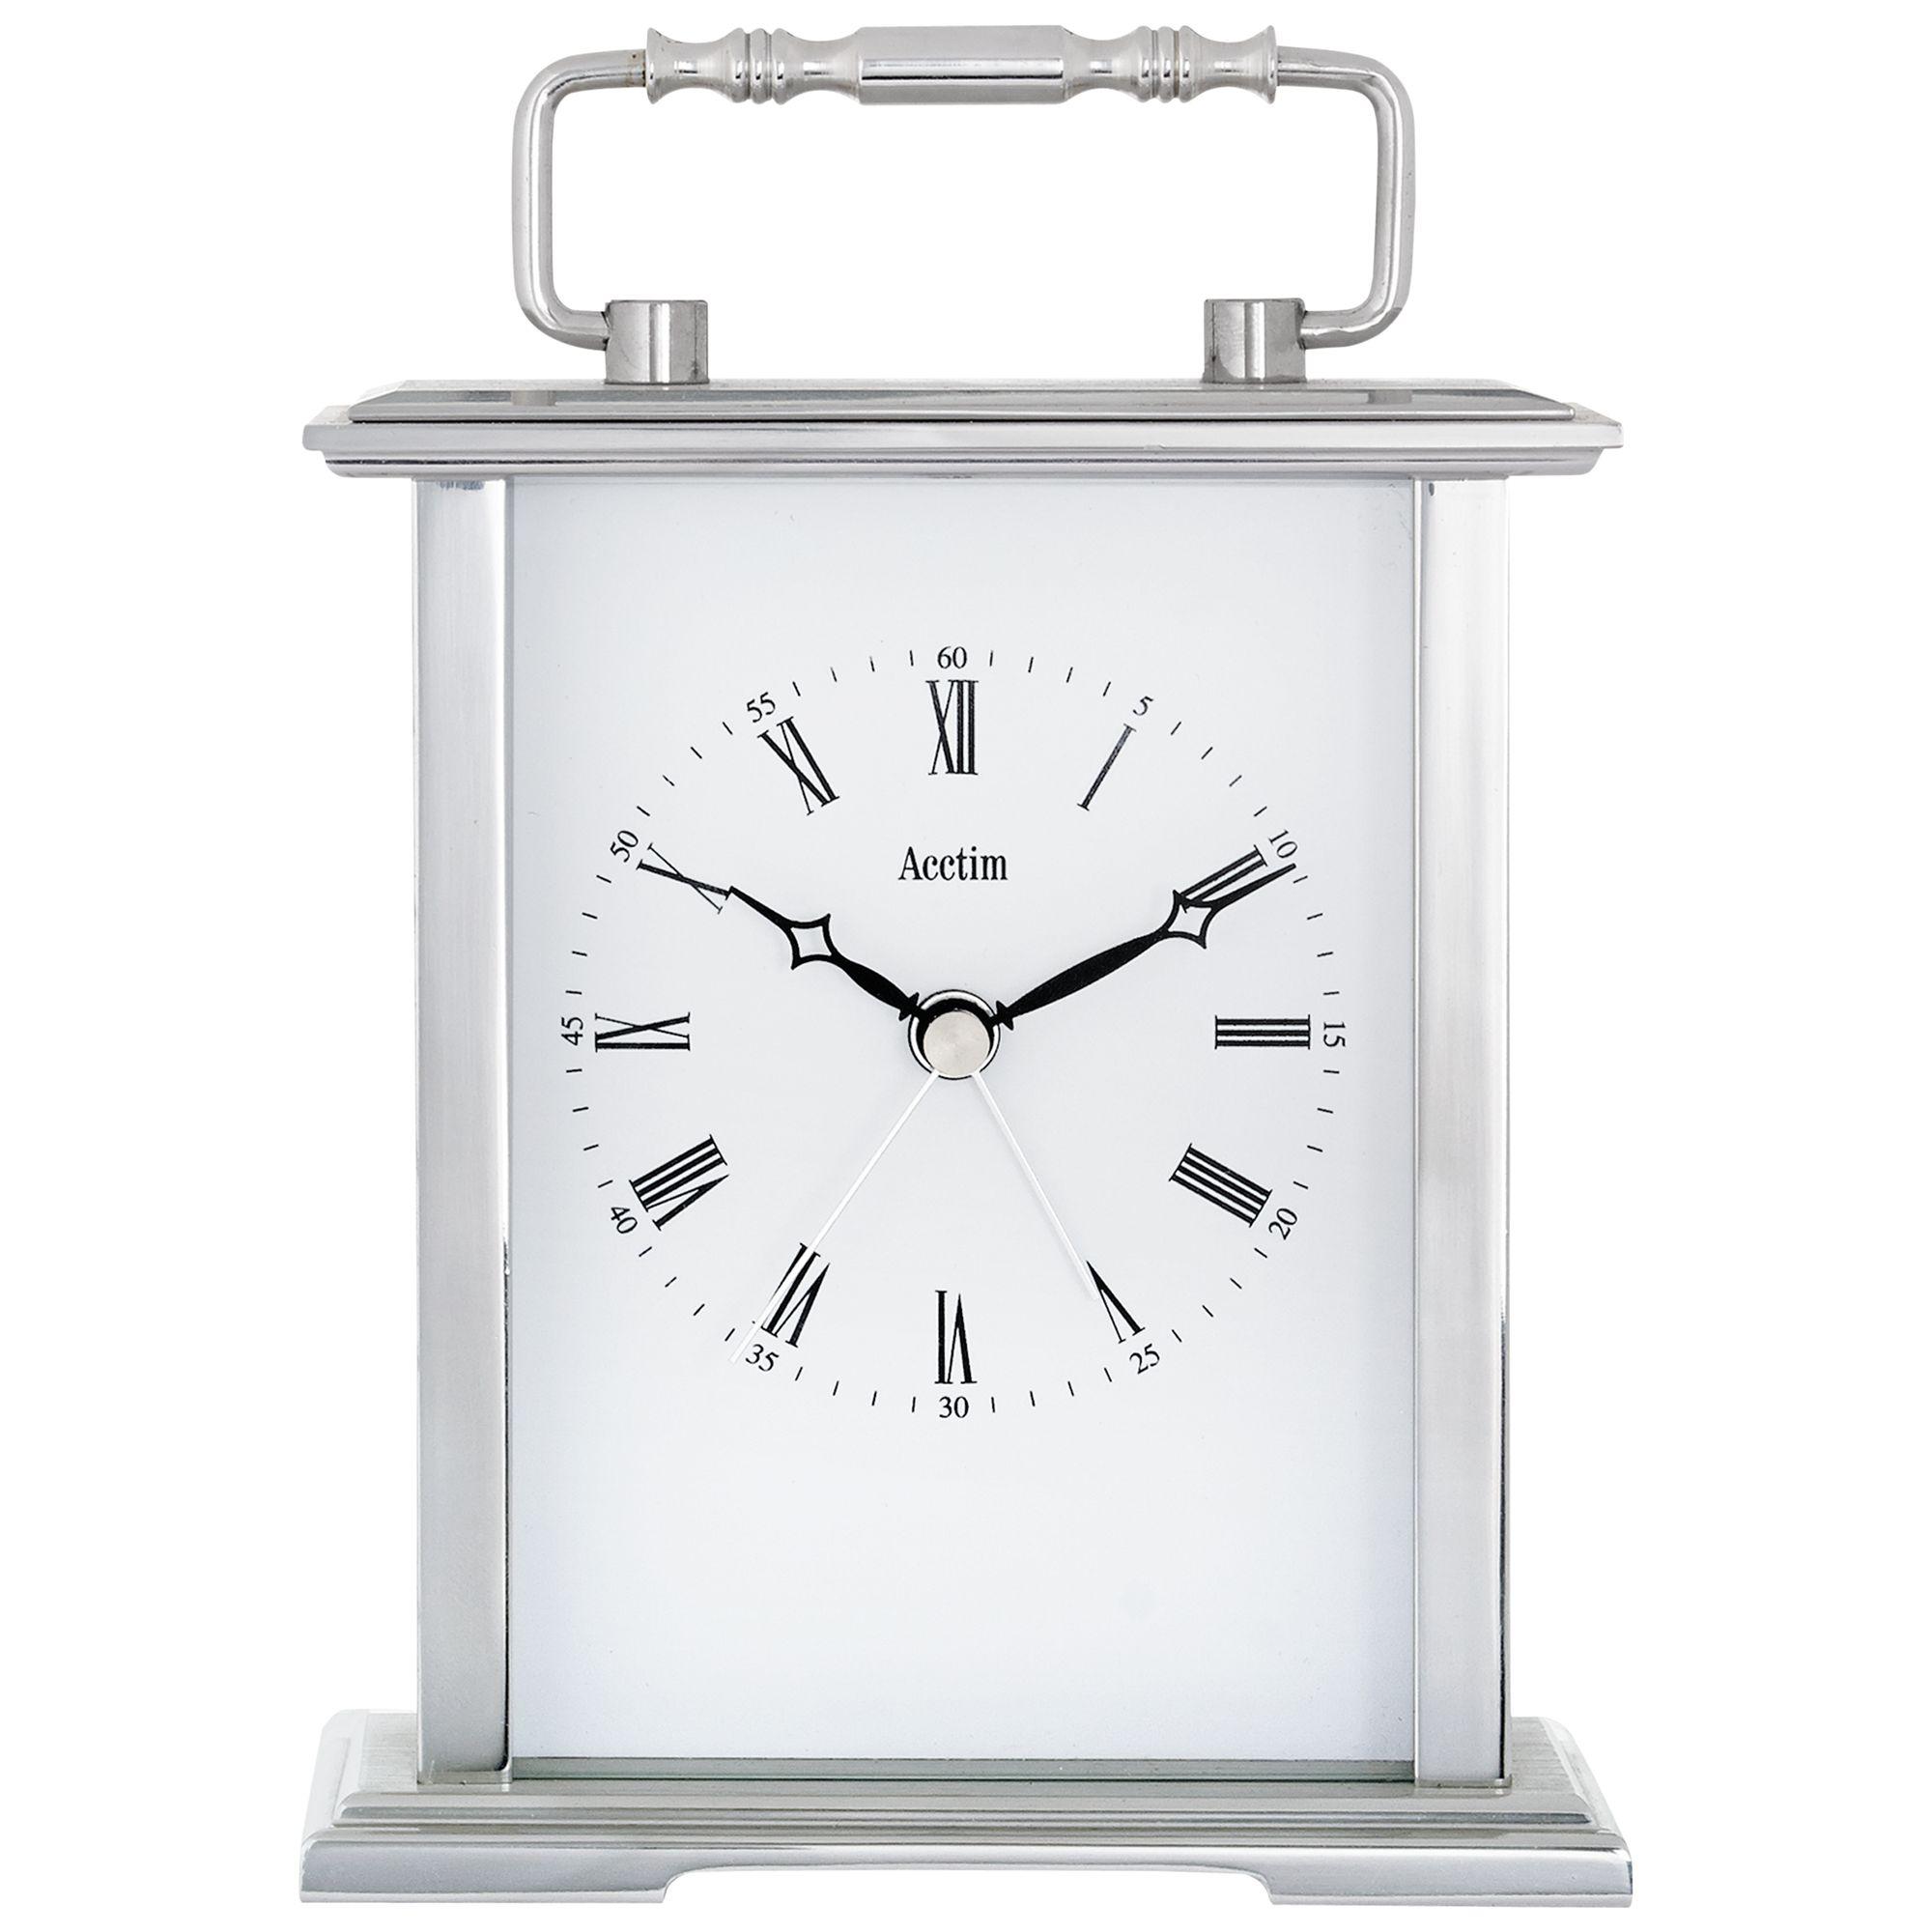 Acctim Acctim Gainsborough Carriage Mantle Clock